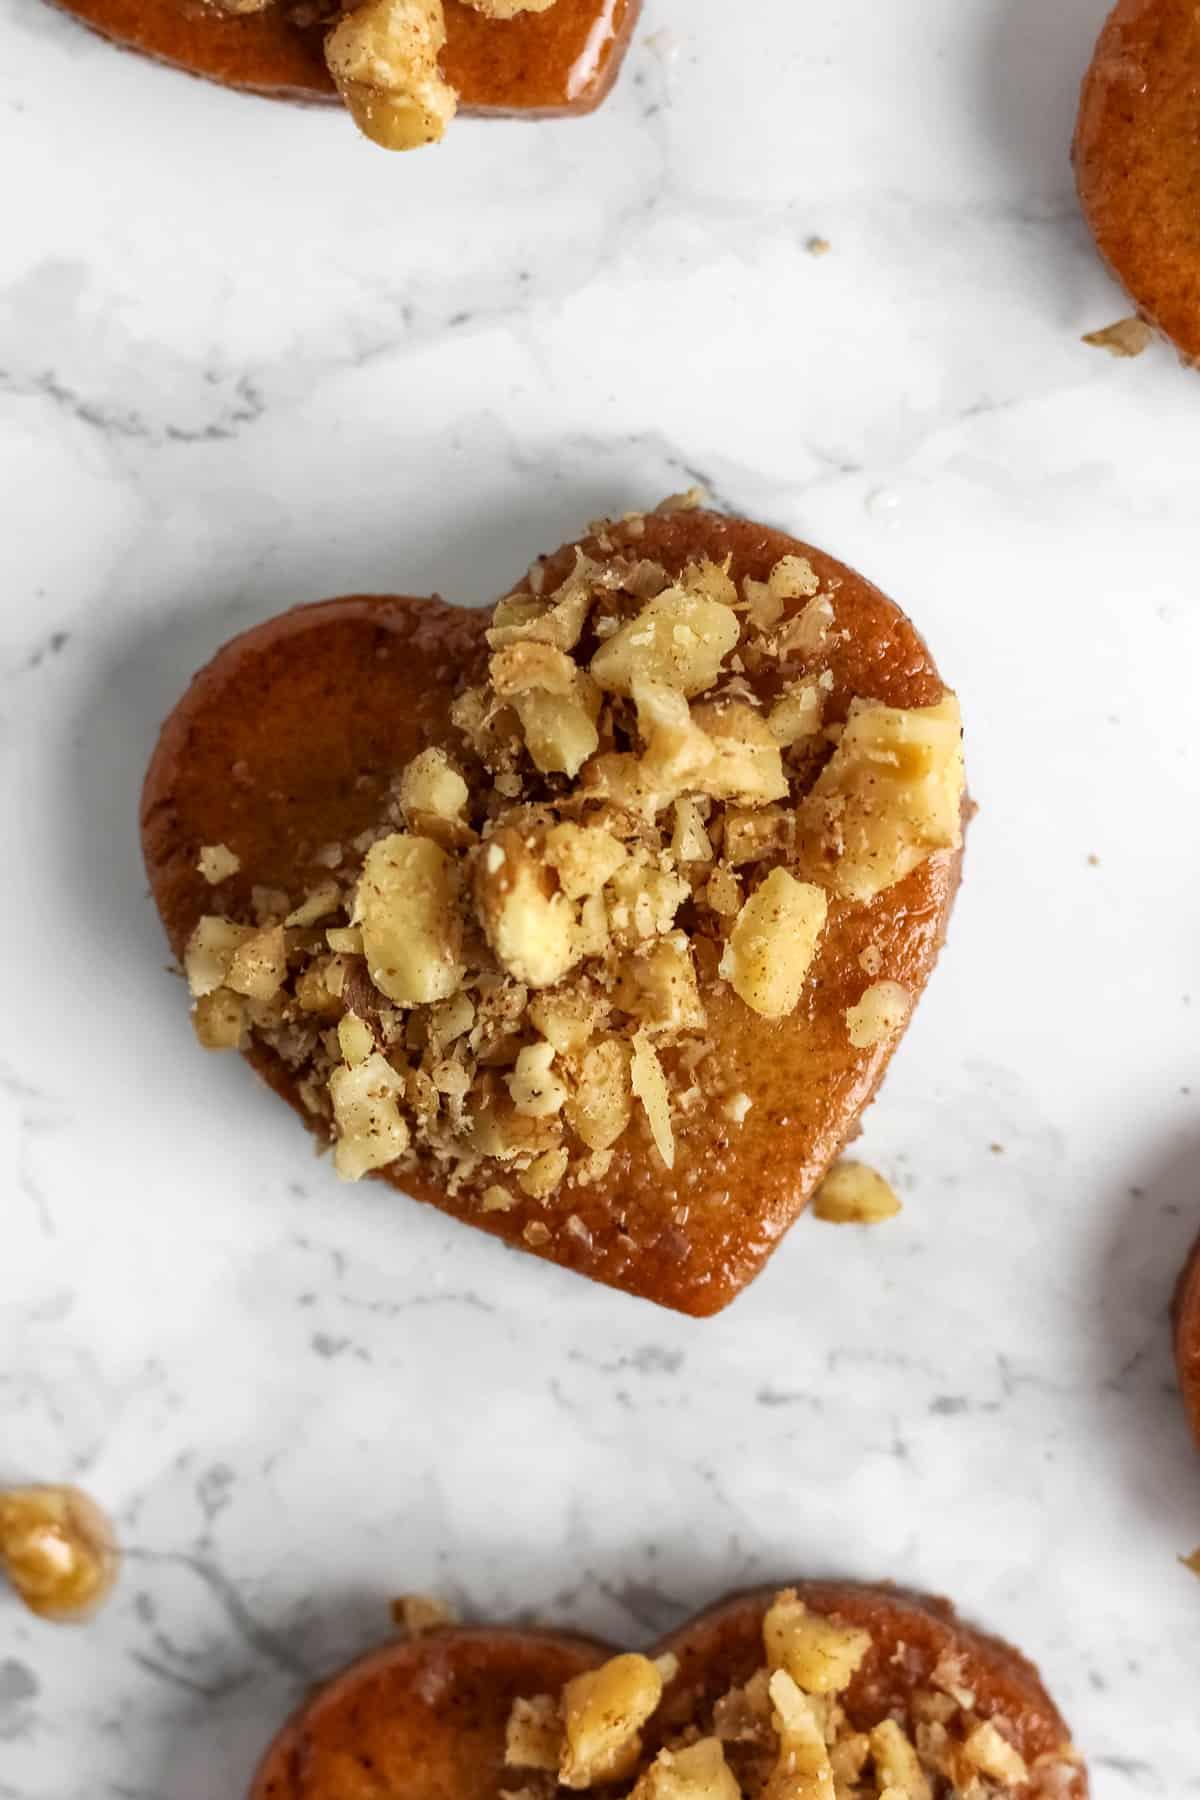 Melomakarona Greek Honey Spice Christmas Cookies 2 Baked Ambrosia